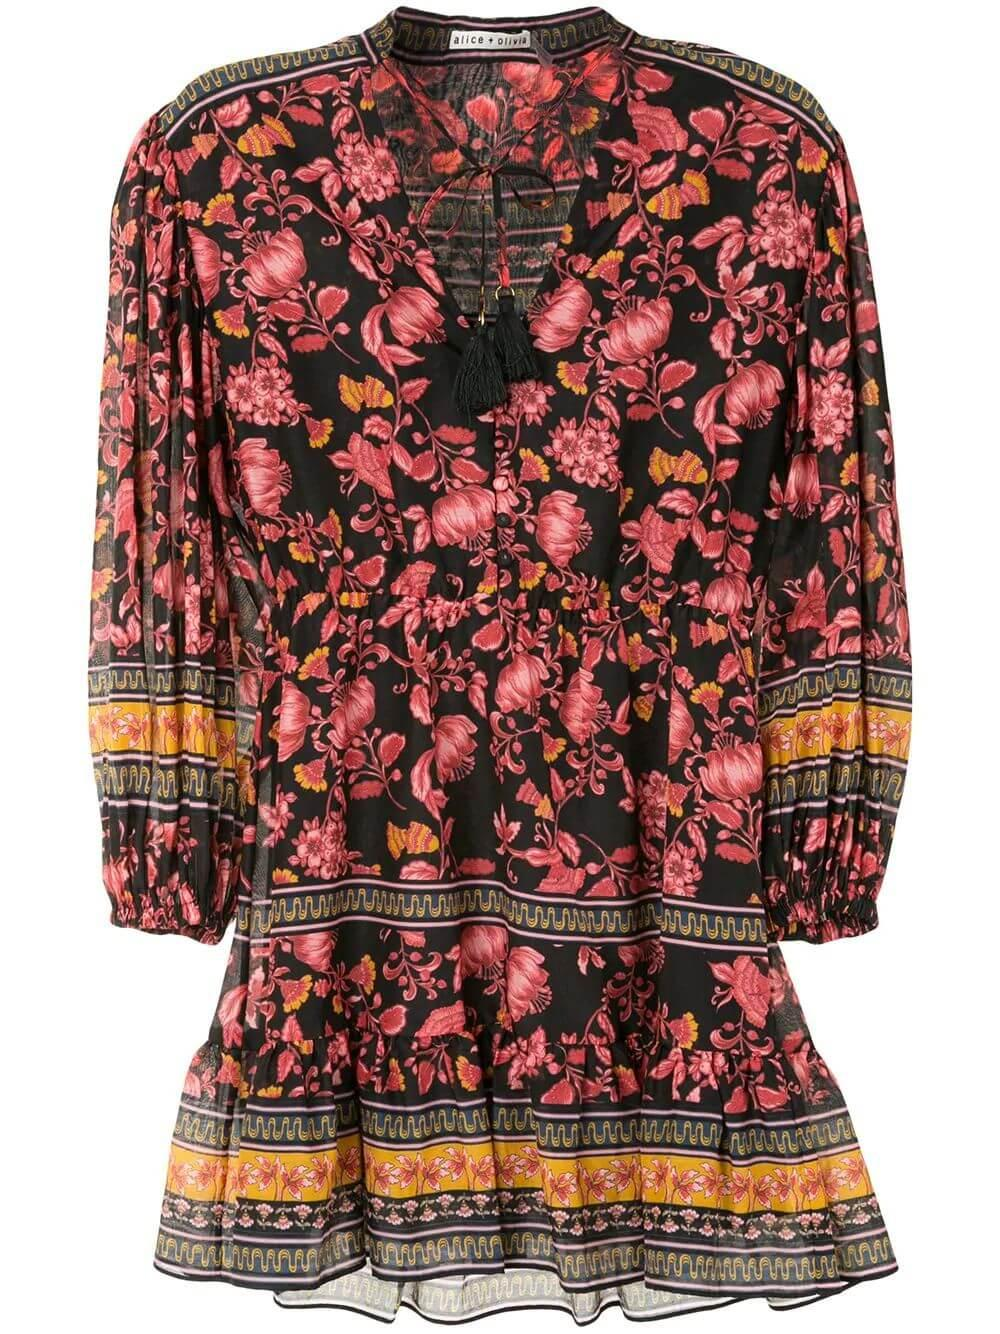 Sedona Floral Print Dress Item # CC007P02502